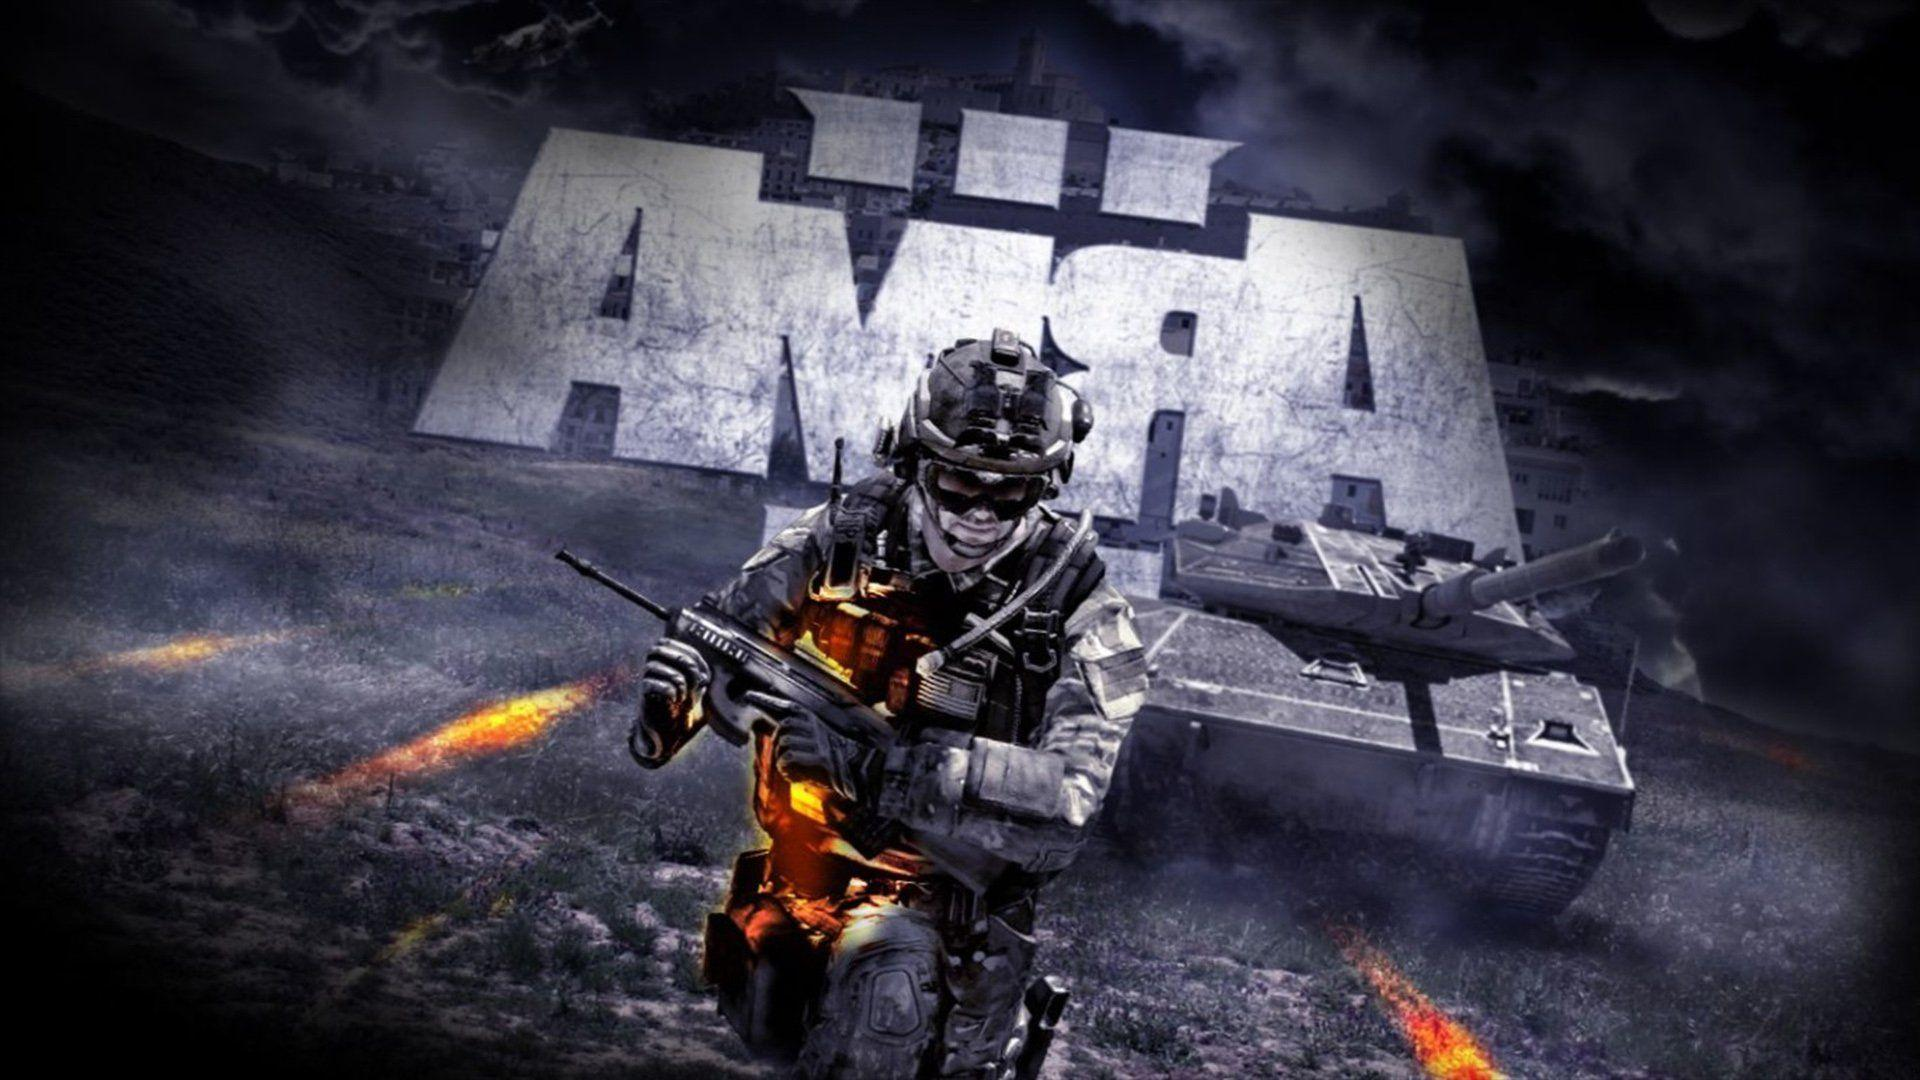 ARMA 3 Wallpapers - Wallpaper Cave